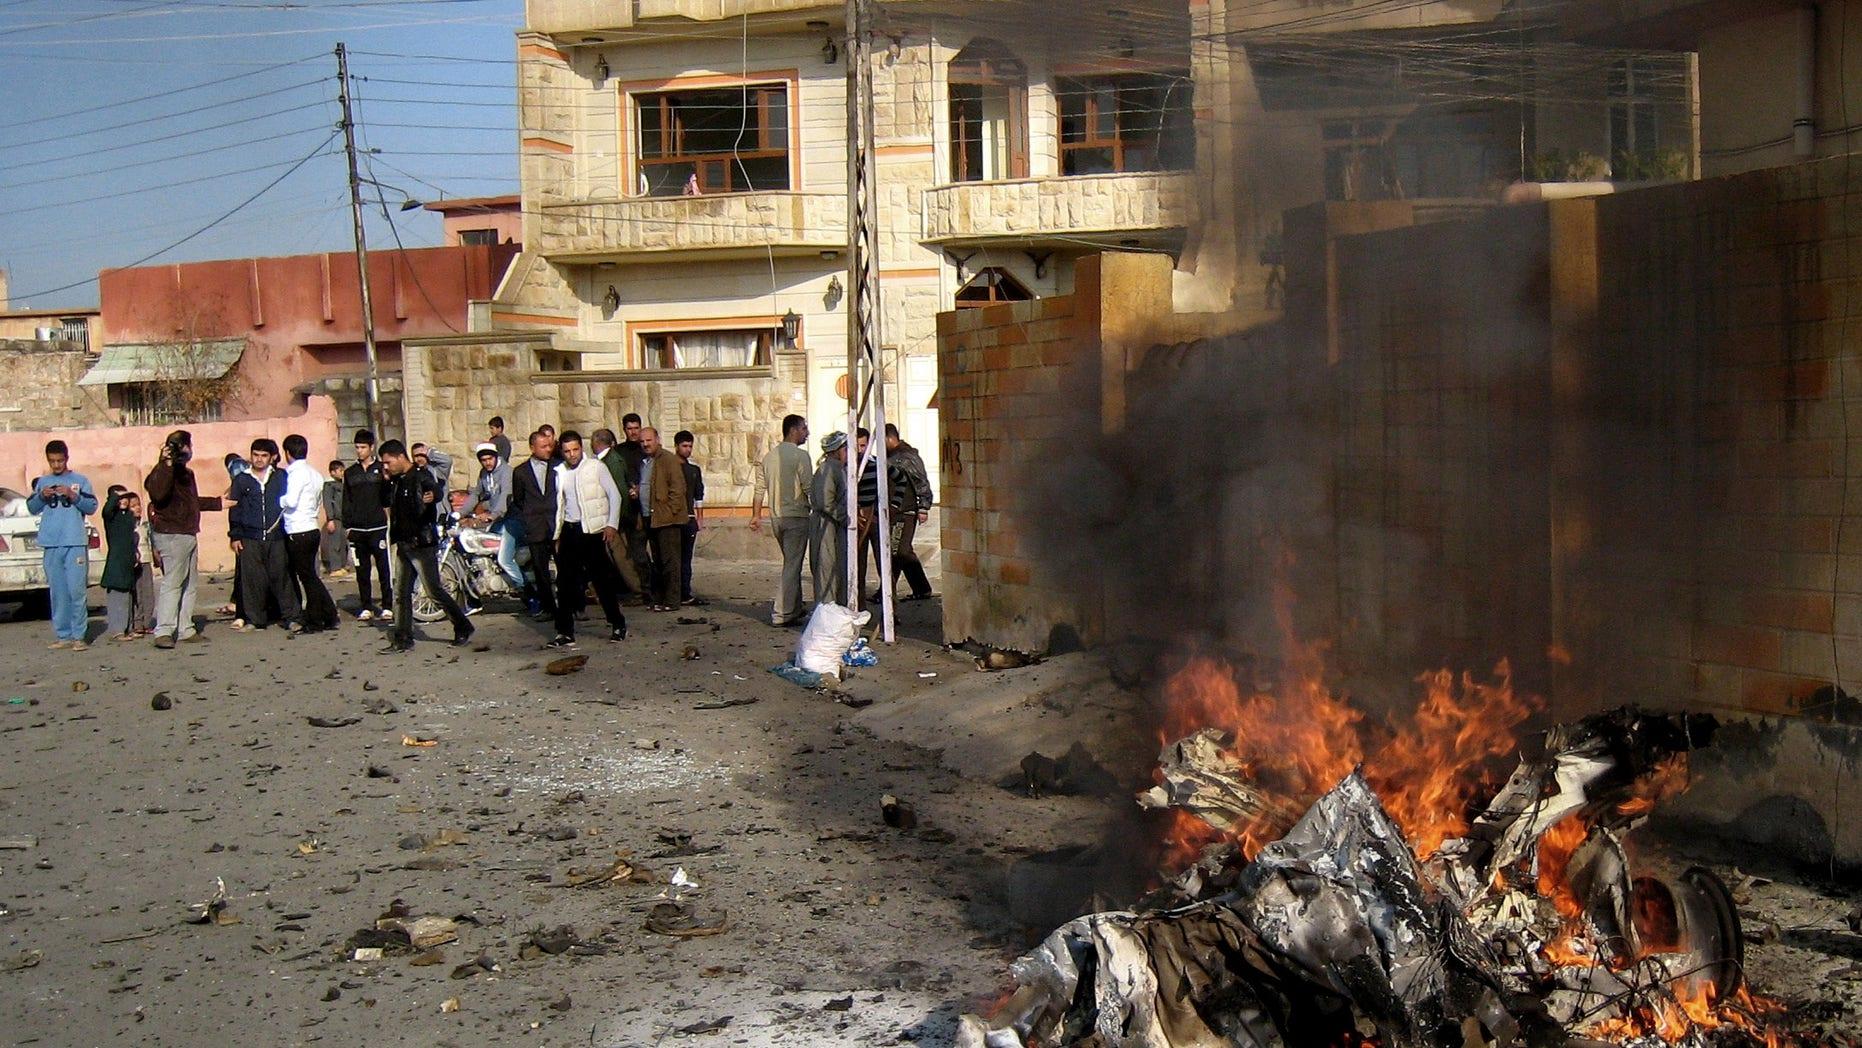 Nov. 27, 2012: Iraqis inspect the scene of a bomb attack in Kirkuk, 180 miles north of Baghdad, Iraq.